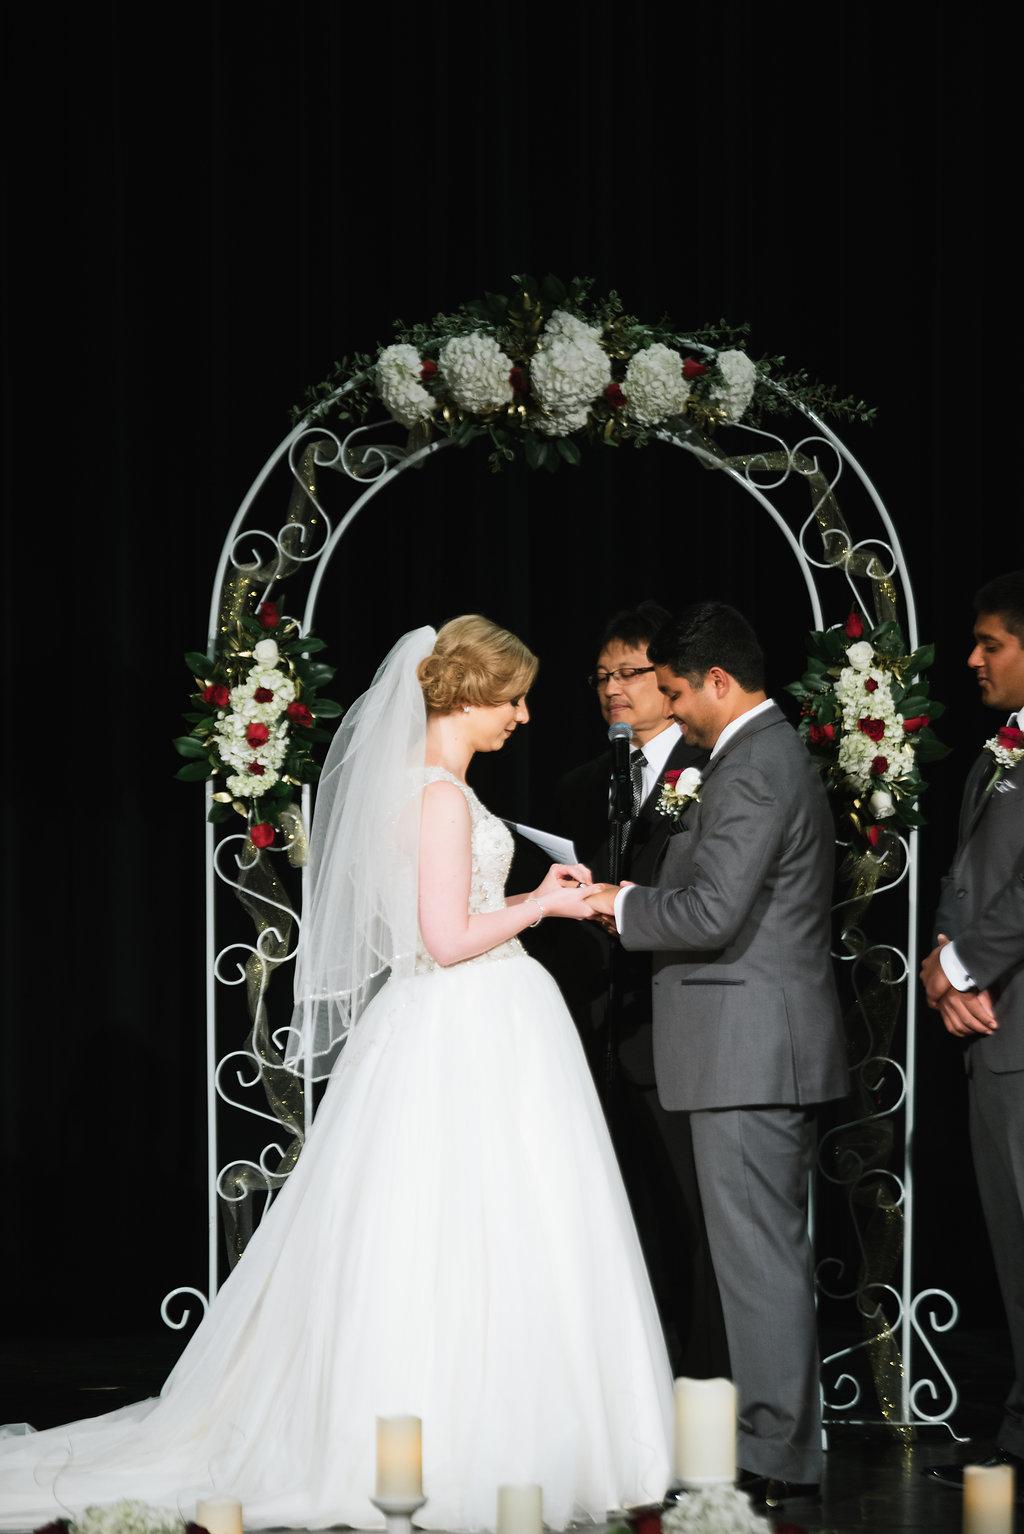 EDWIN-WEDDING-301.jpg